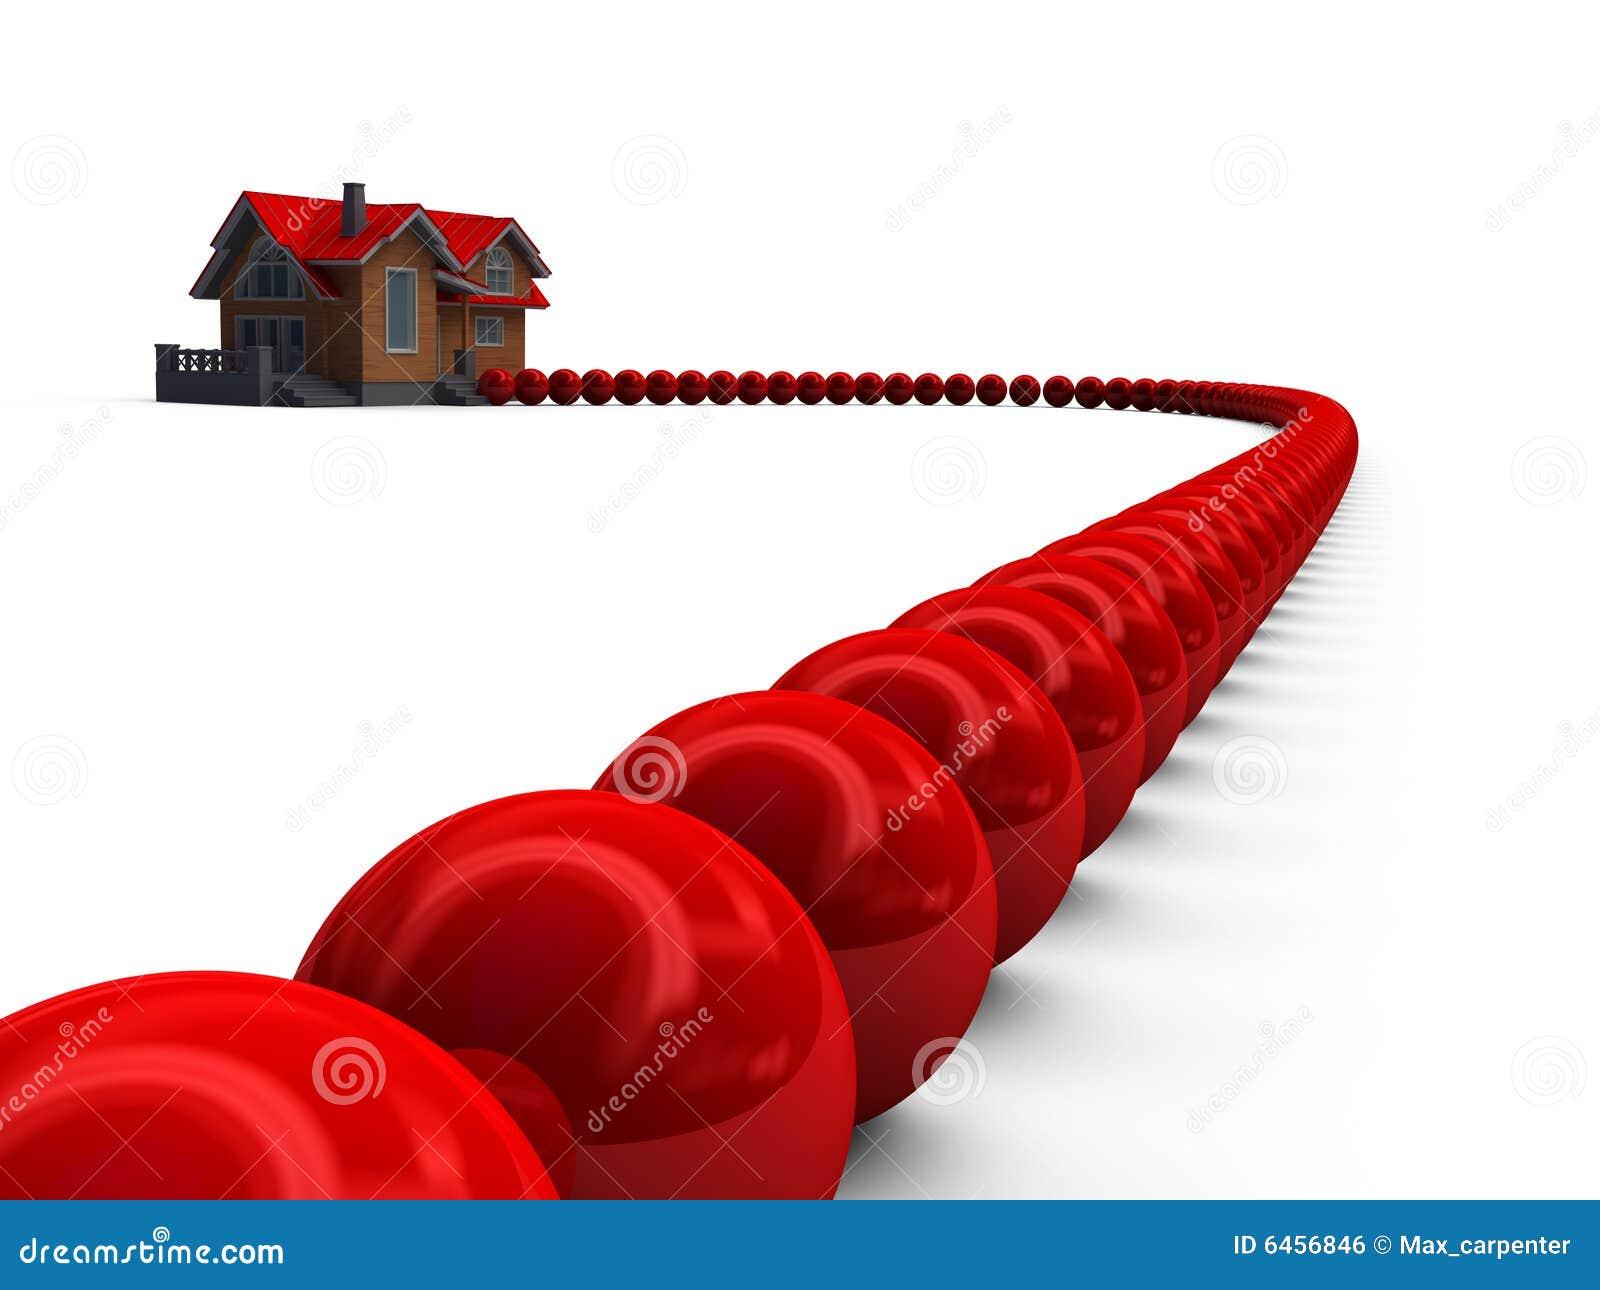 Hipoteka subprime pojęcie kryzysu